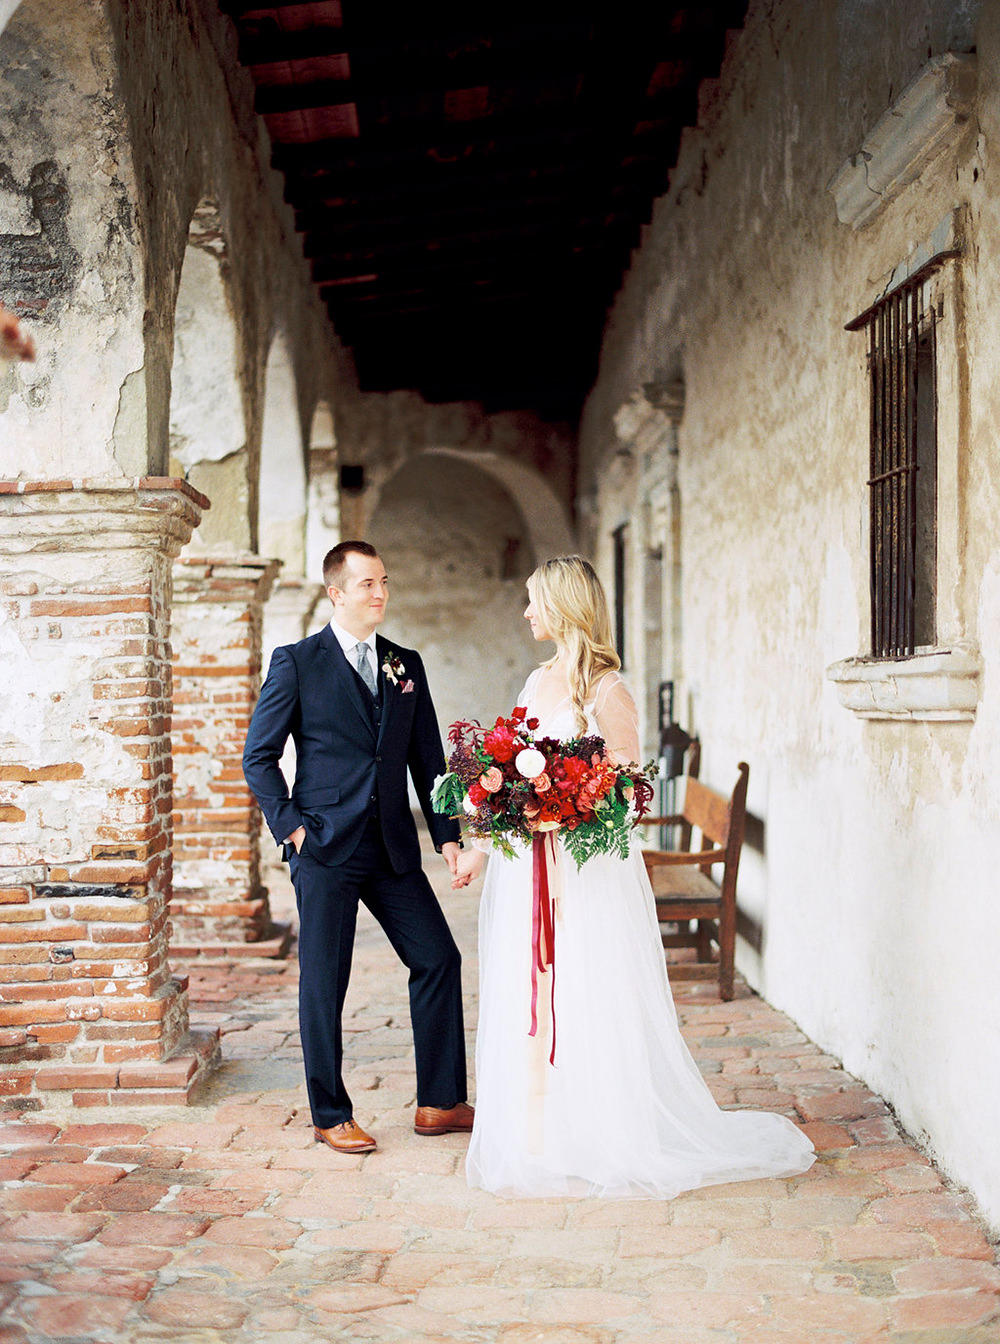 wedding inspiration - photo by Amanda Lenhardt https://ruffledblog.com/relaxed-san-juan-capistrano-wedding-inspiration